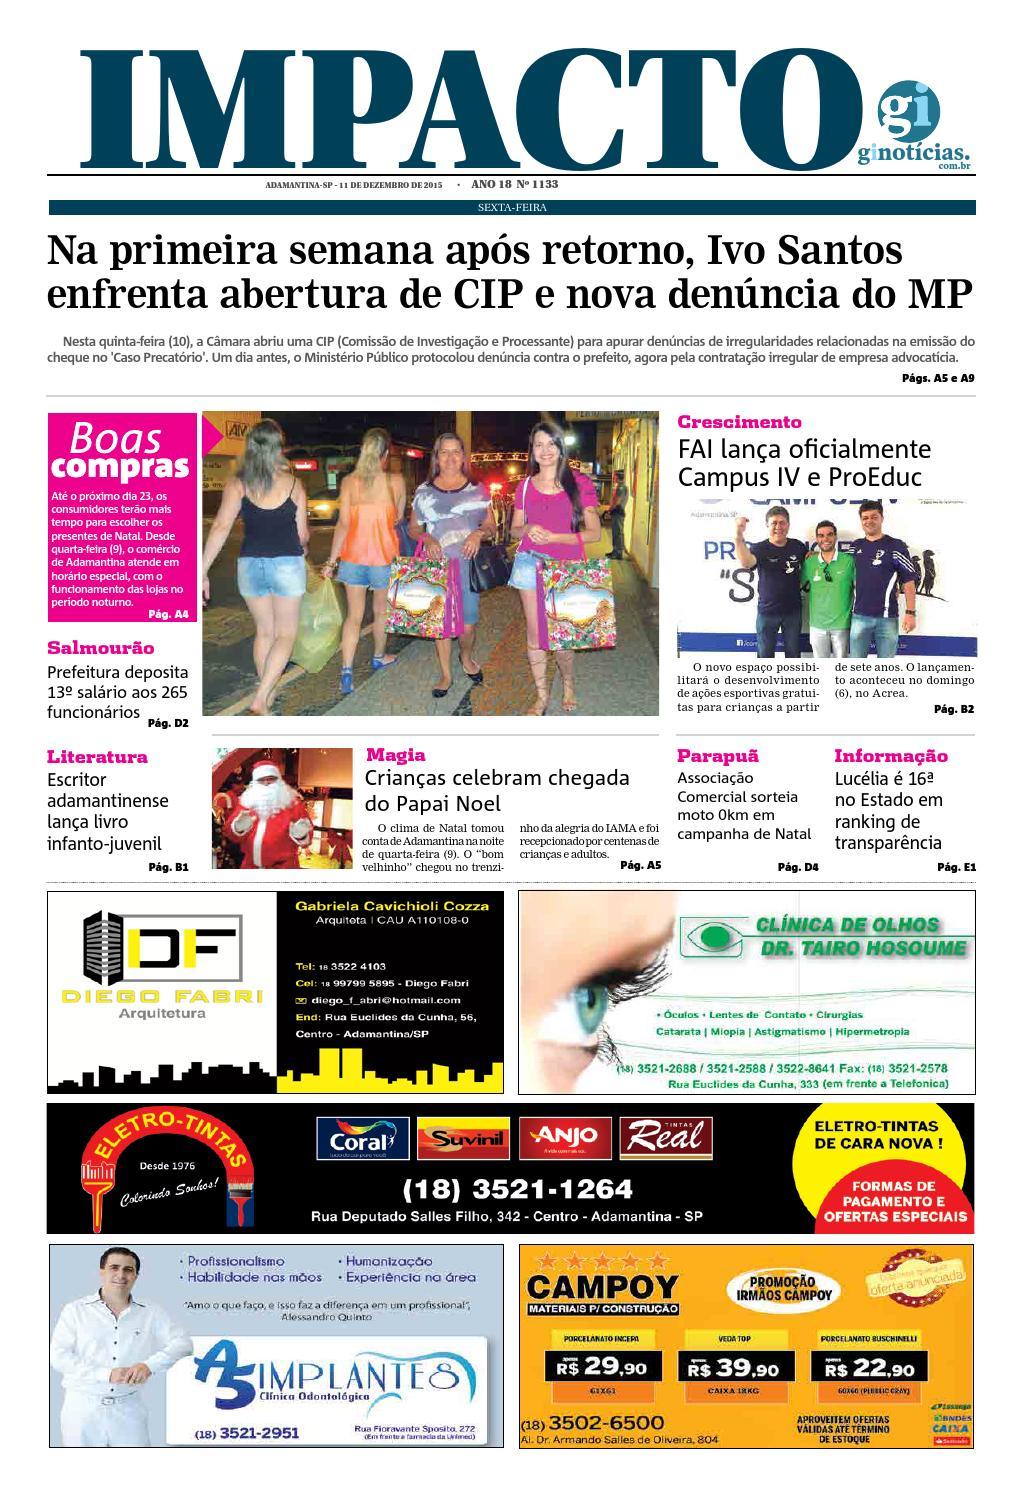 6e6b365a4f Jornal impacto 11 12 2015 by IMPACTO - issuu